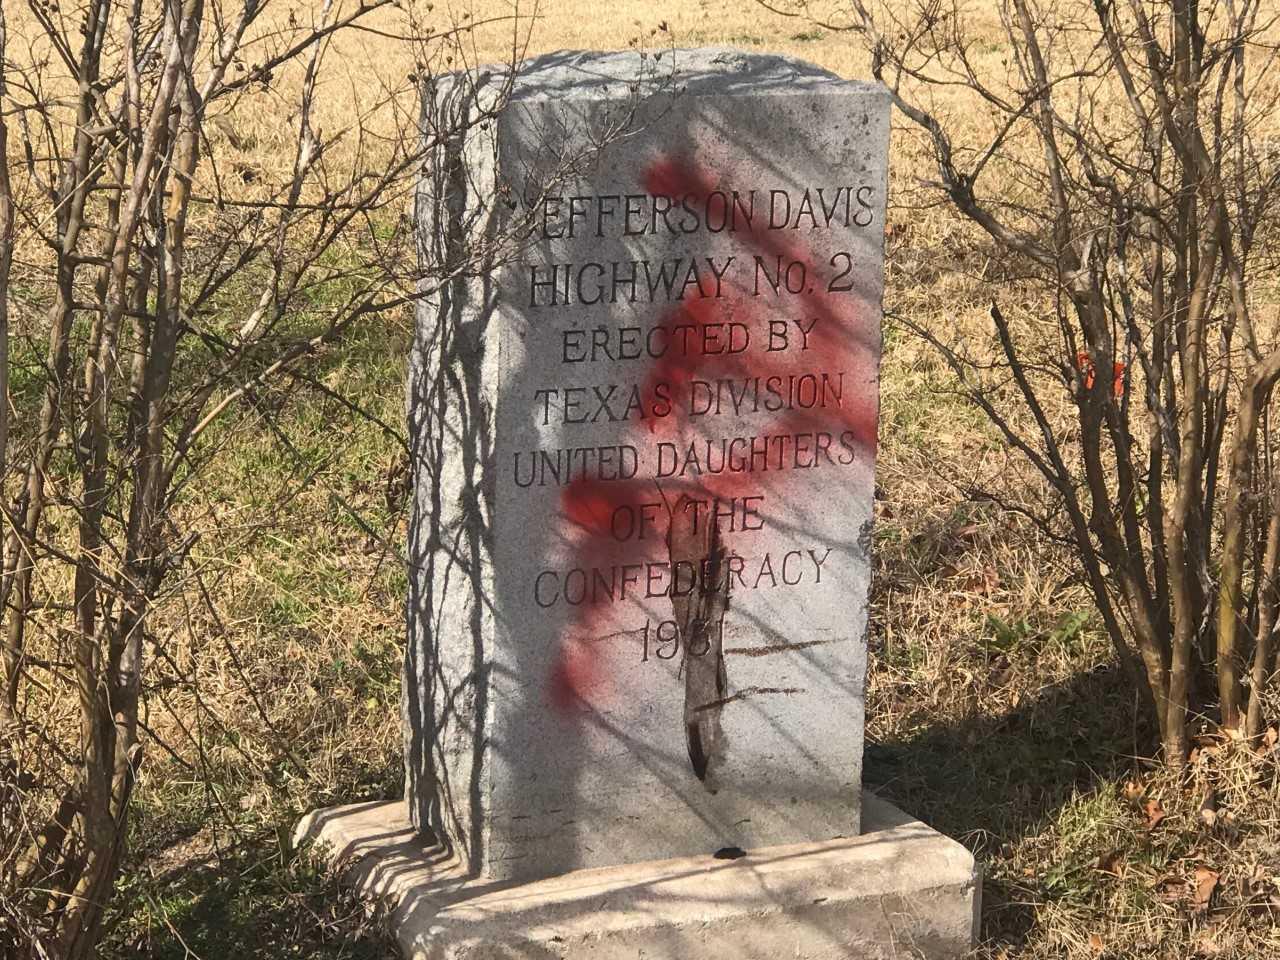 Jefferson Davis marker vandalized_622420